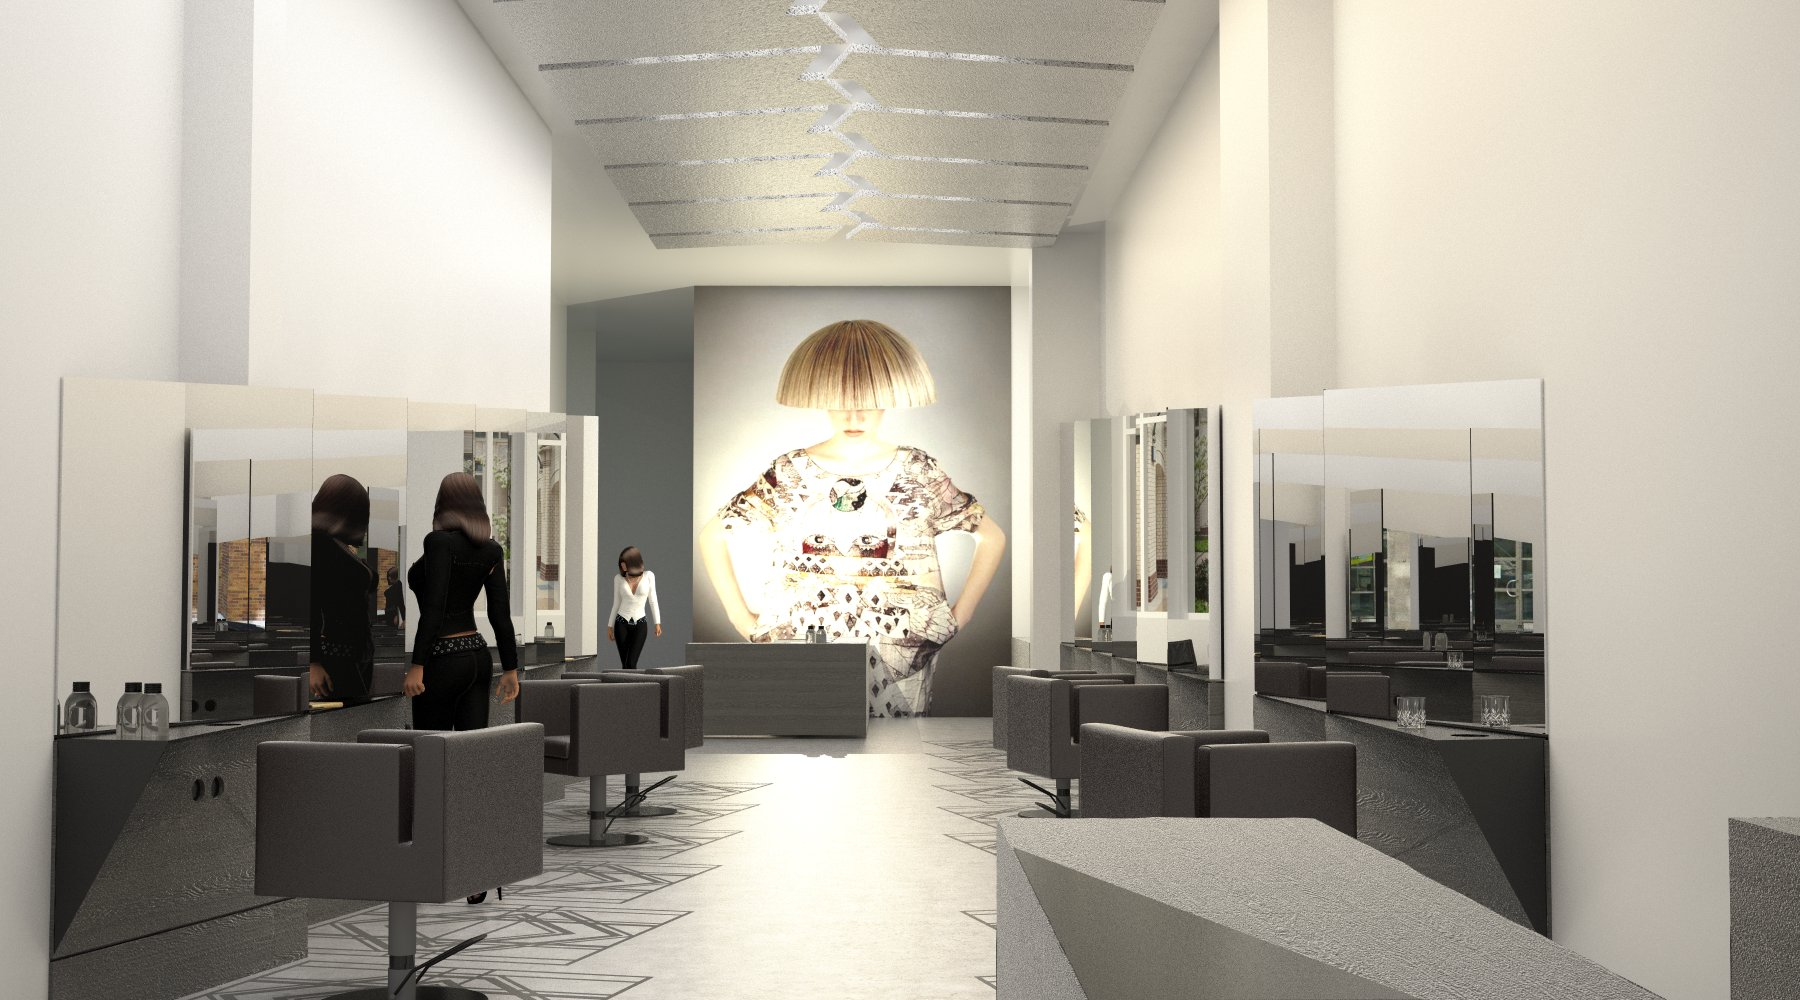 SHIFT FRISEURE | Berlin, Mitte - IOX Architekten